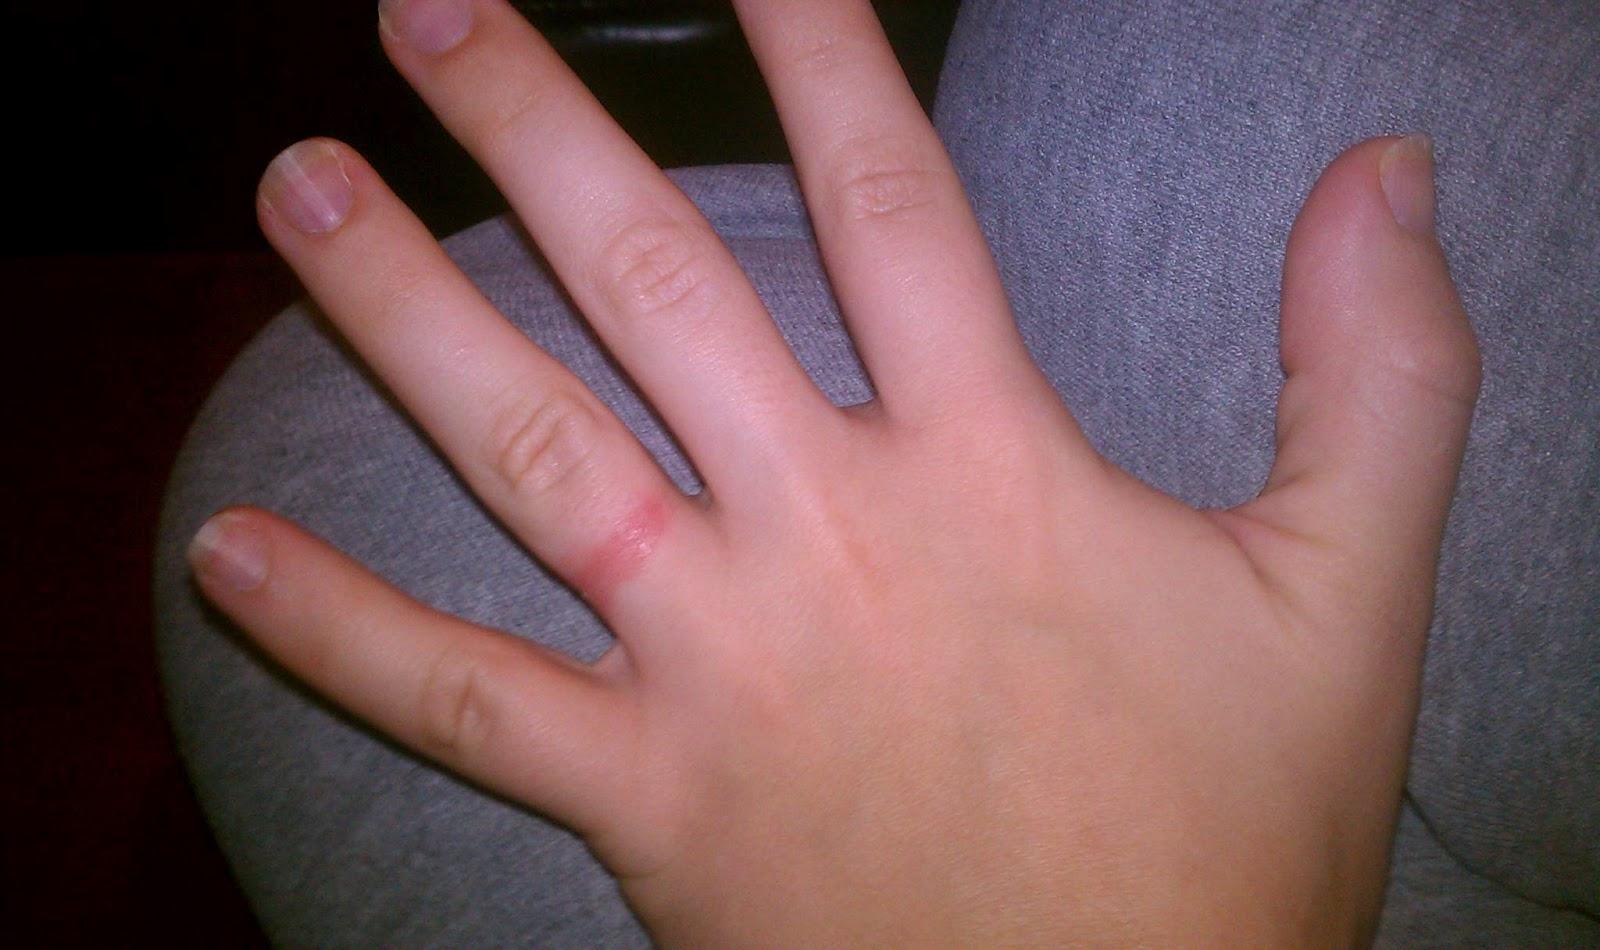 My Wedding Ring Is Giving Me A Rash